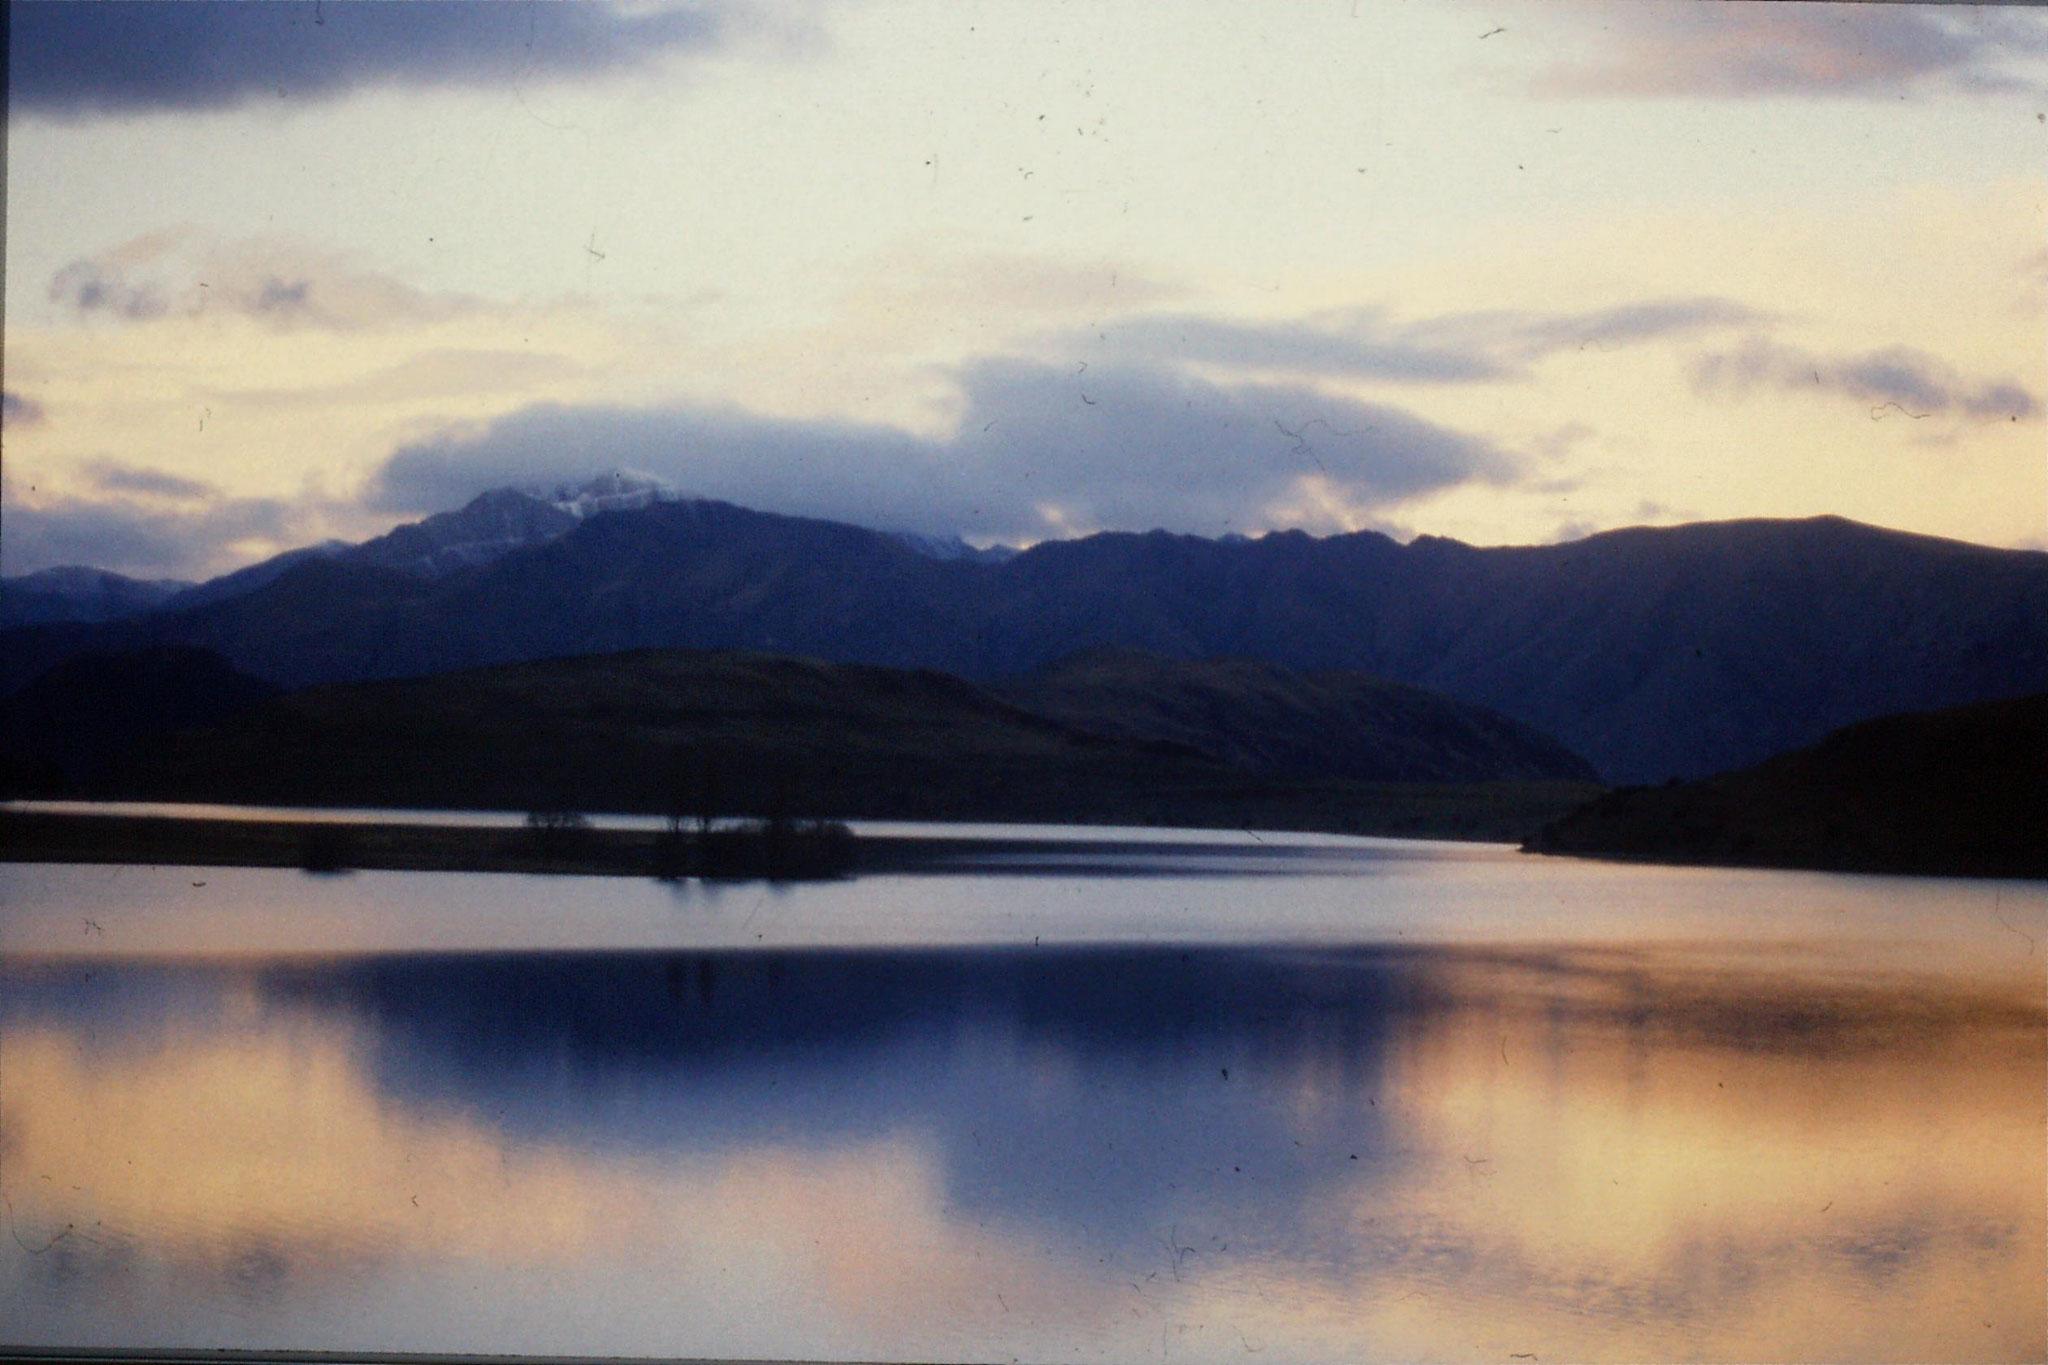 19/8/1990: 14: Wanaka Lake